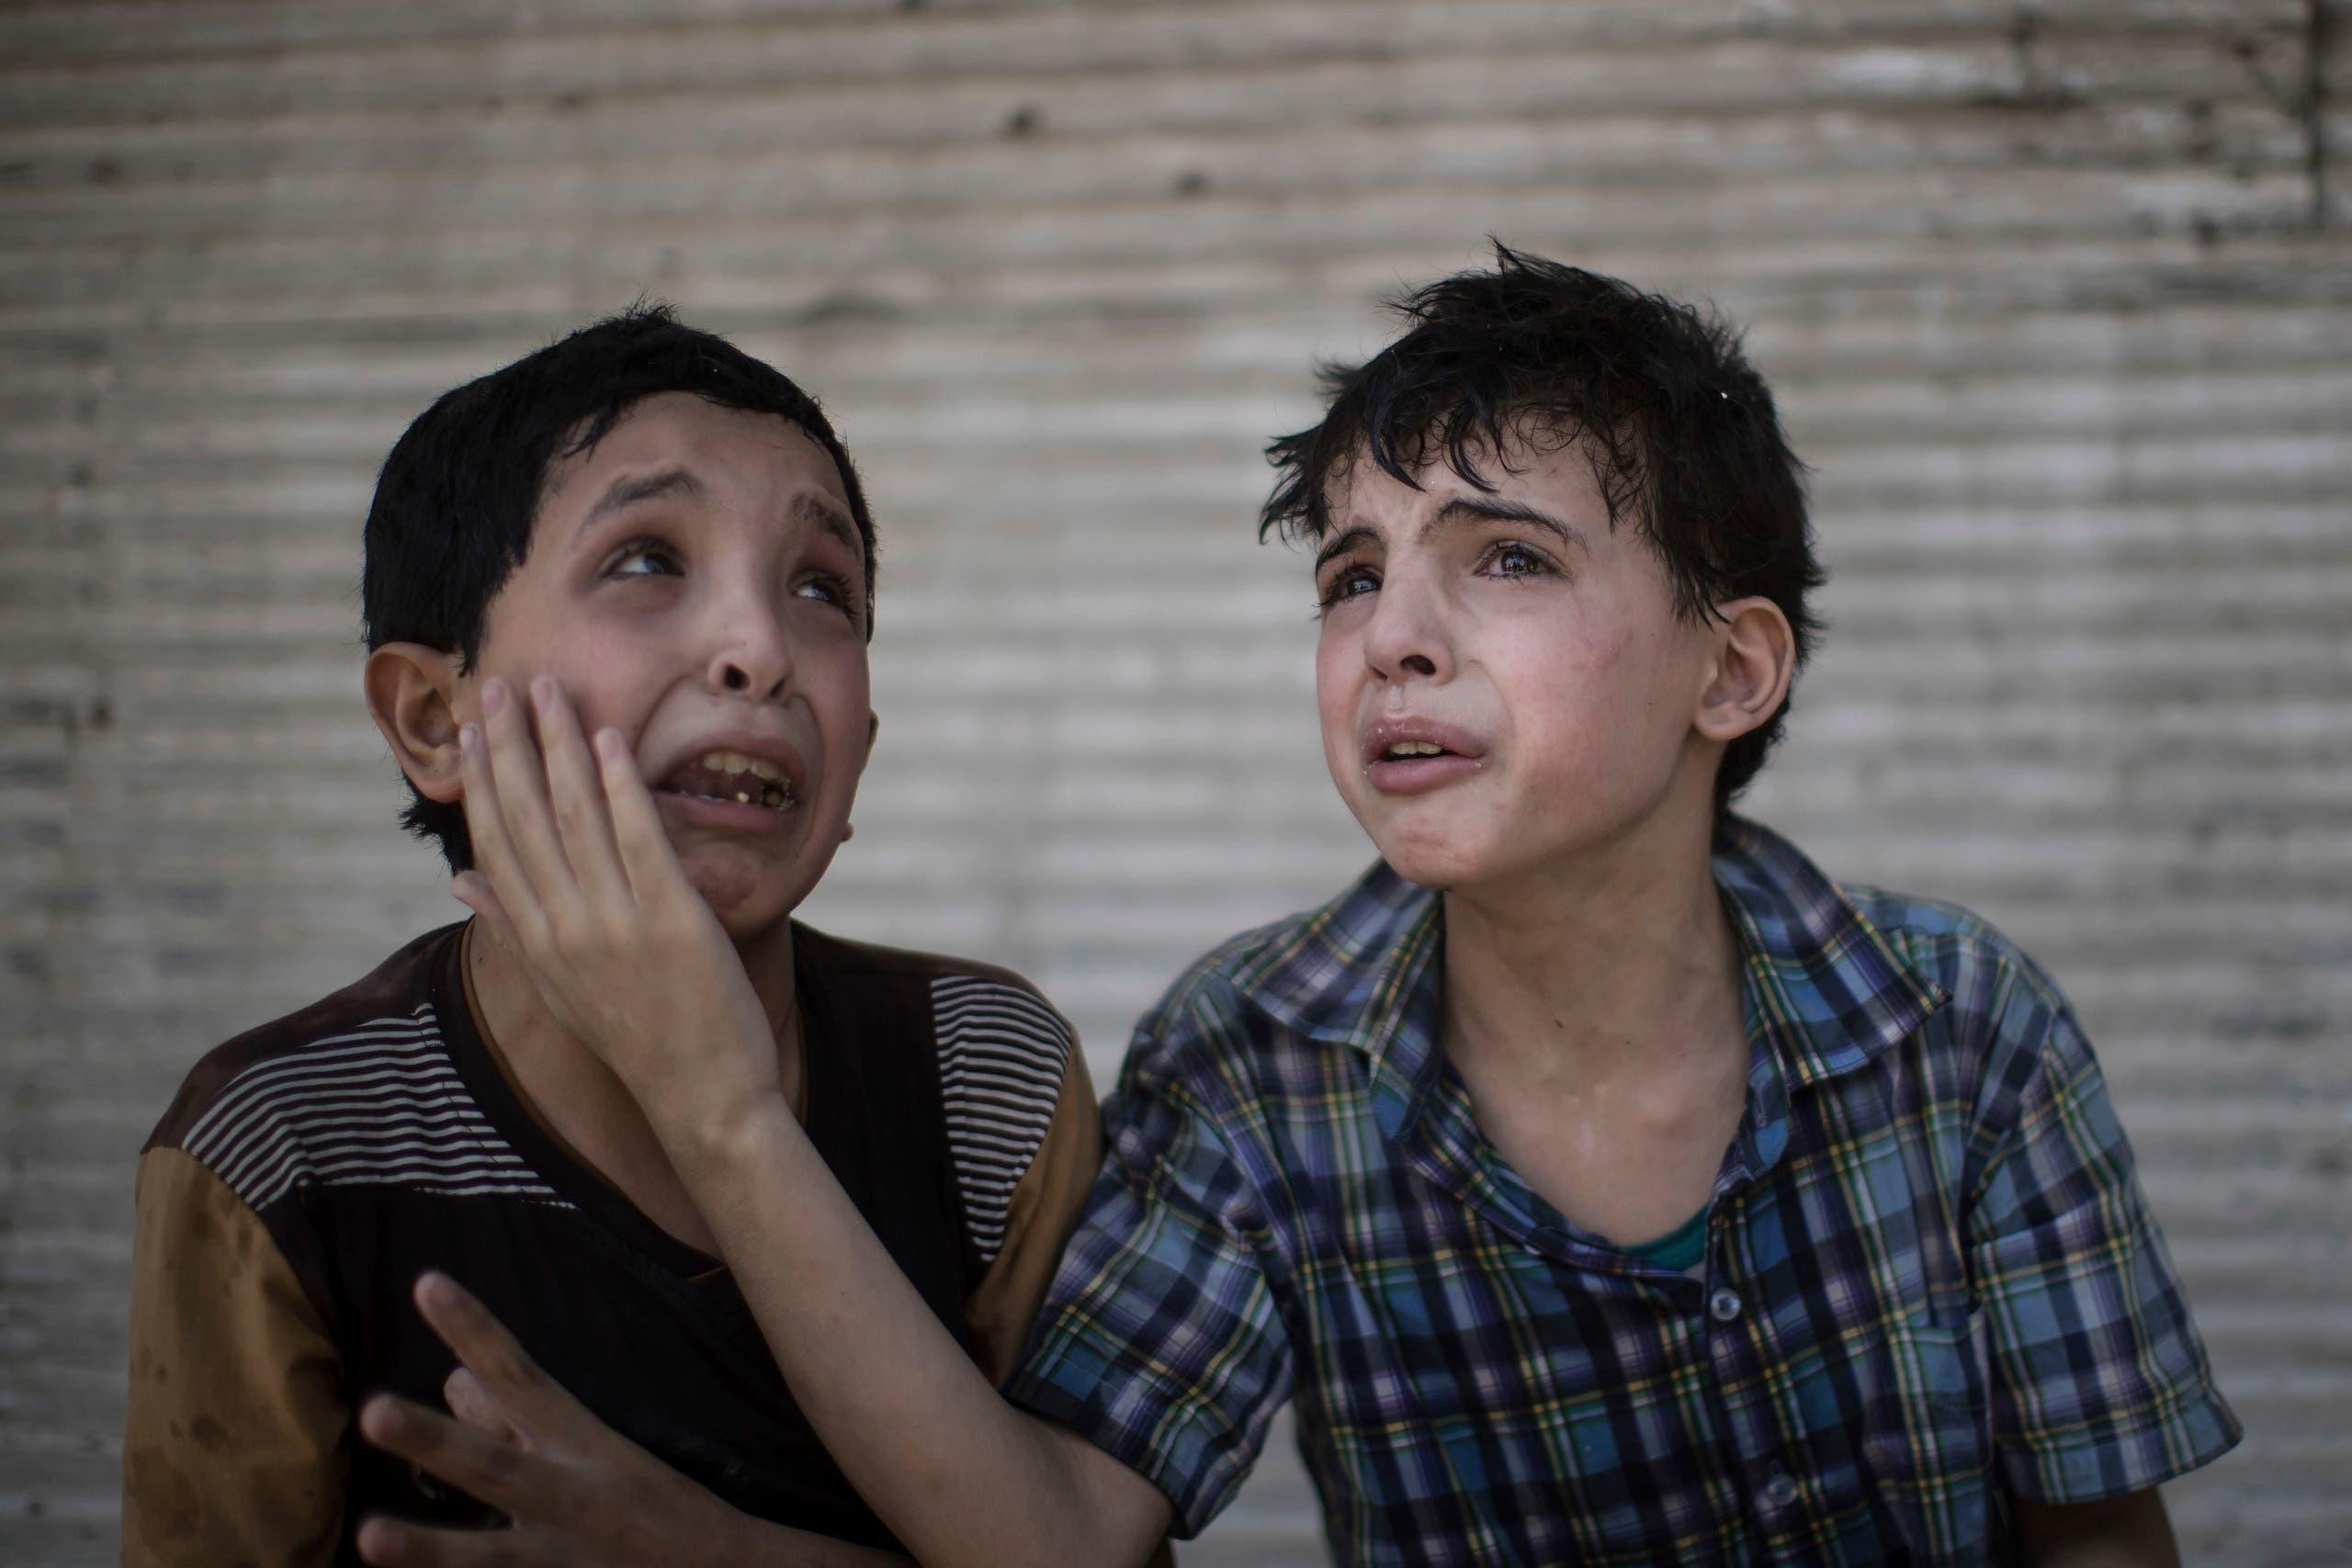 iraqi mosul children ap